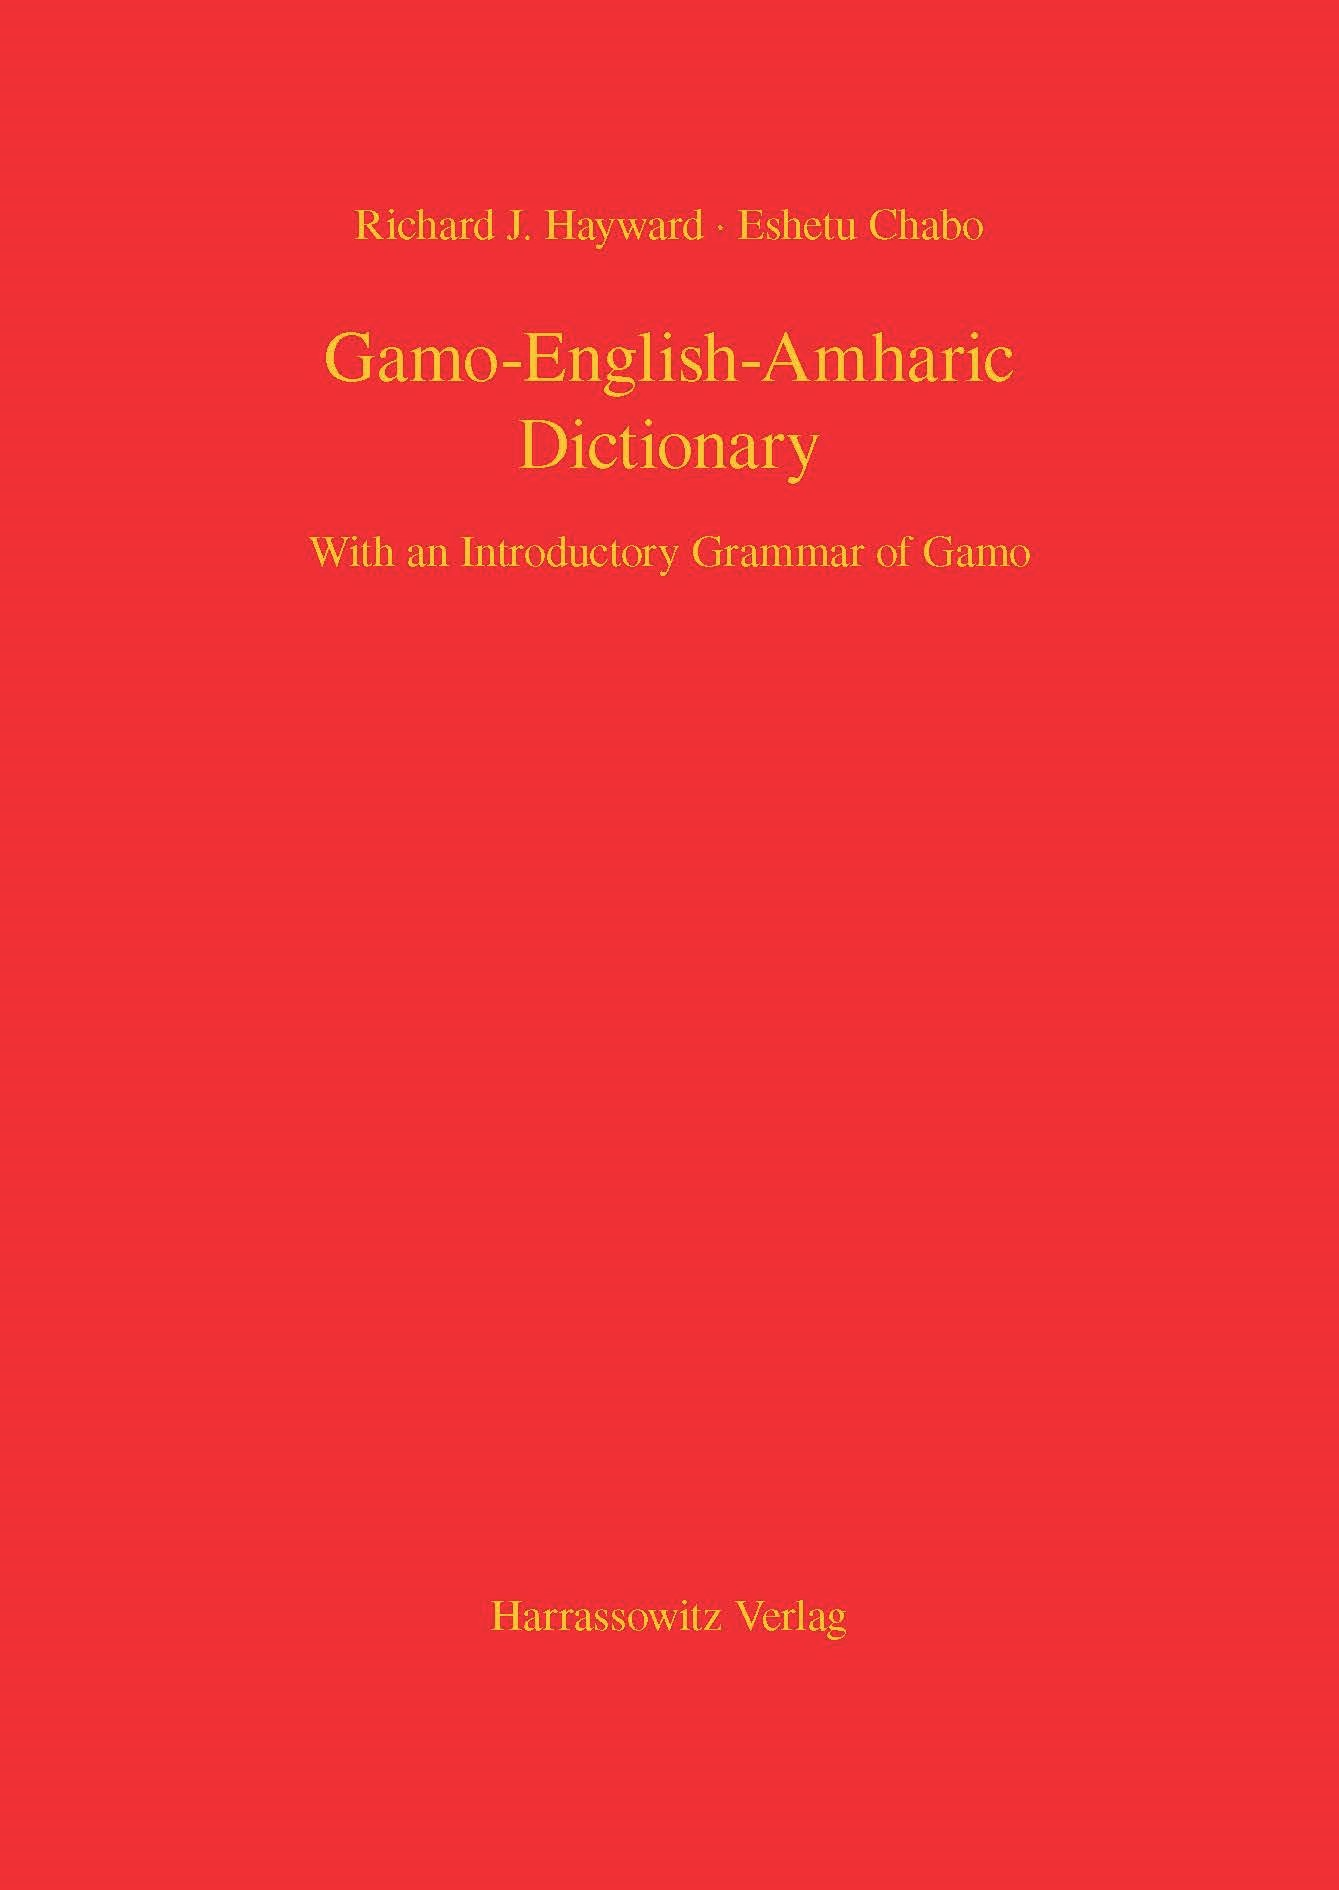 Abbildung von Hayward / Chabo | Gamo-English-Amharic Dictionary With an Introductory Grammar of Gamo | 2014